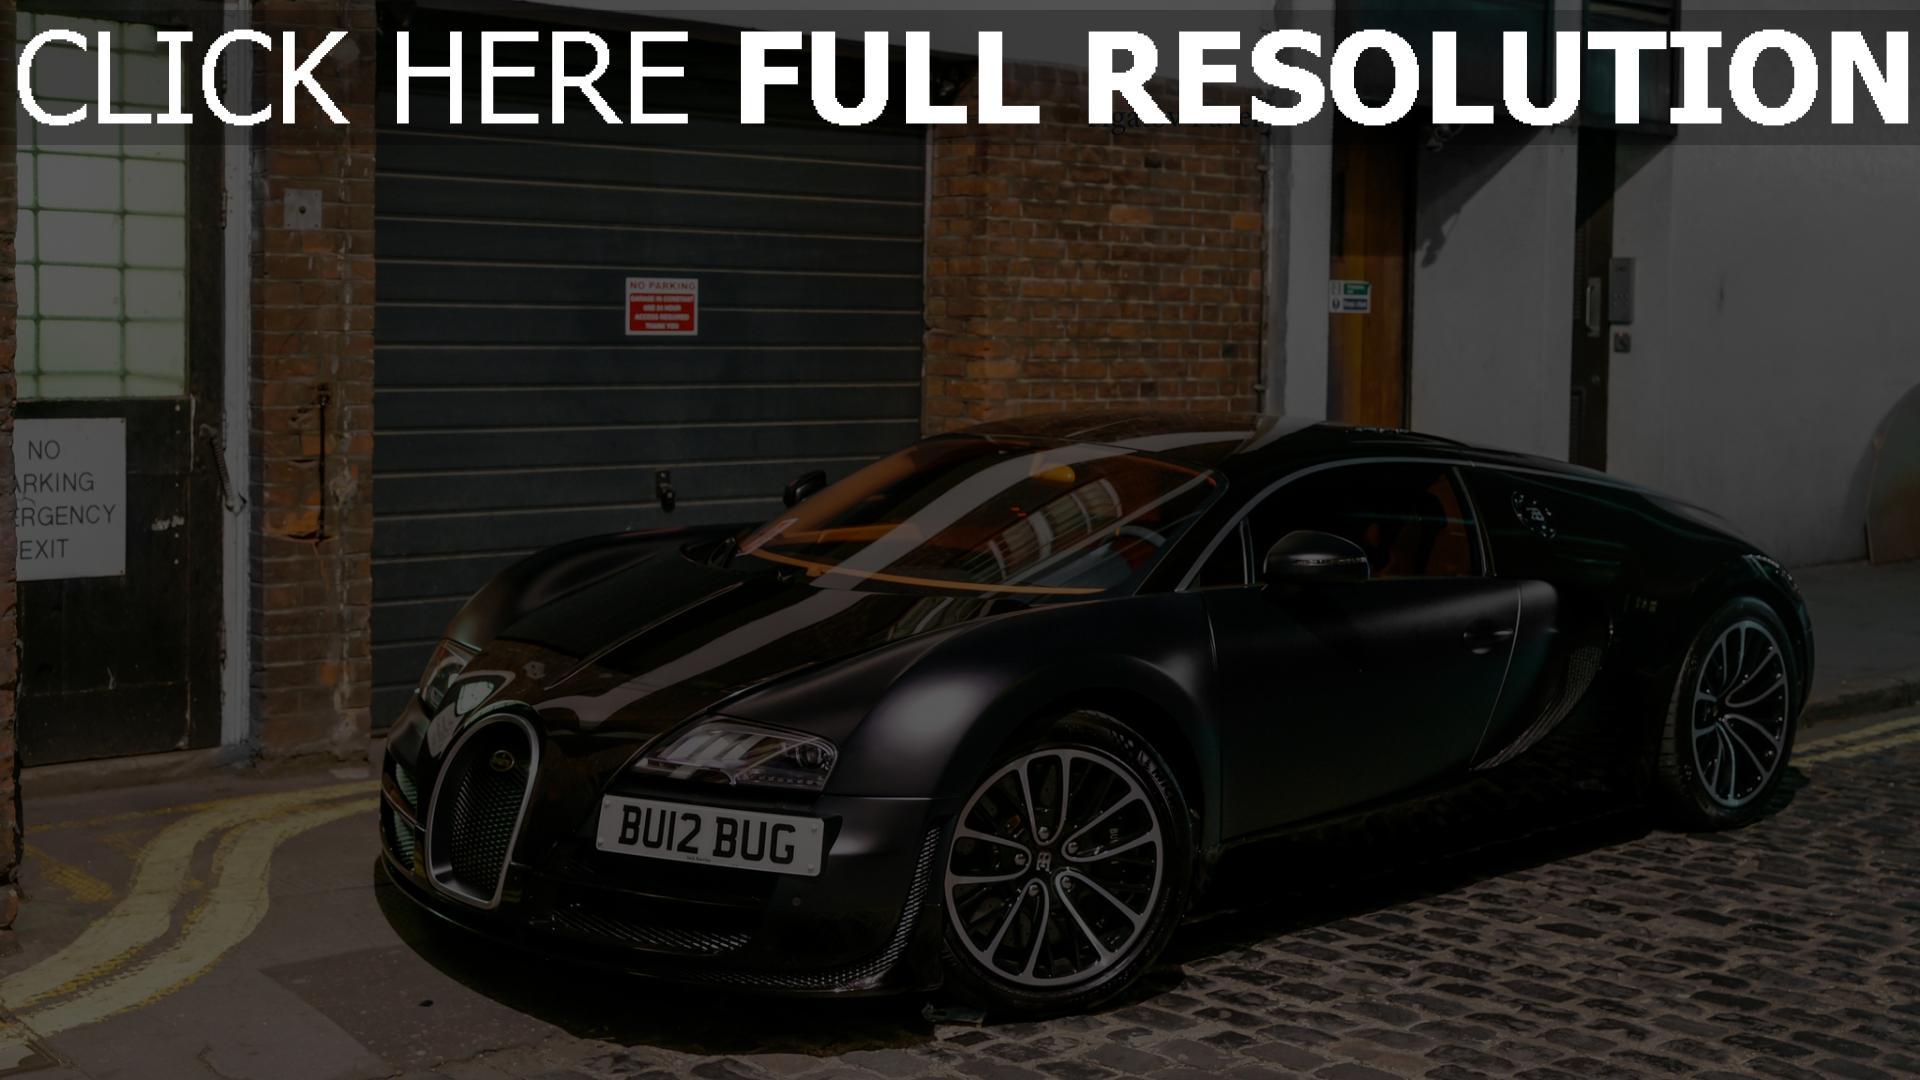 Hd Hintergrundbilder Bugatti Veyron Supercar Matt Schwarz